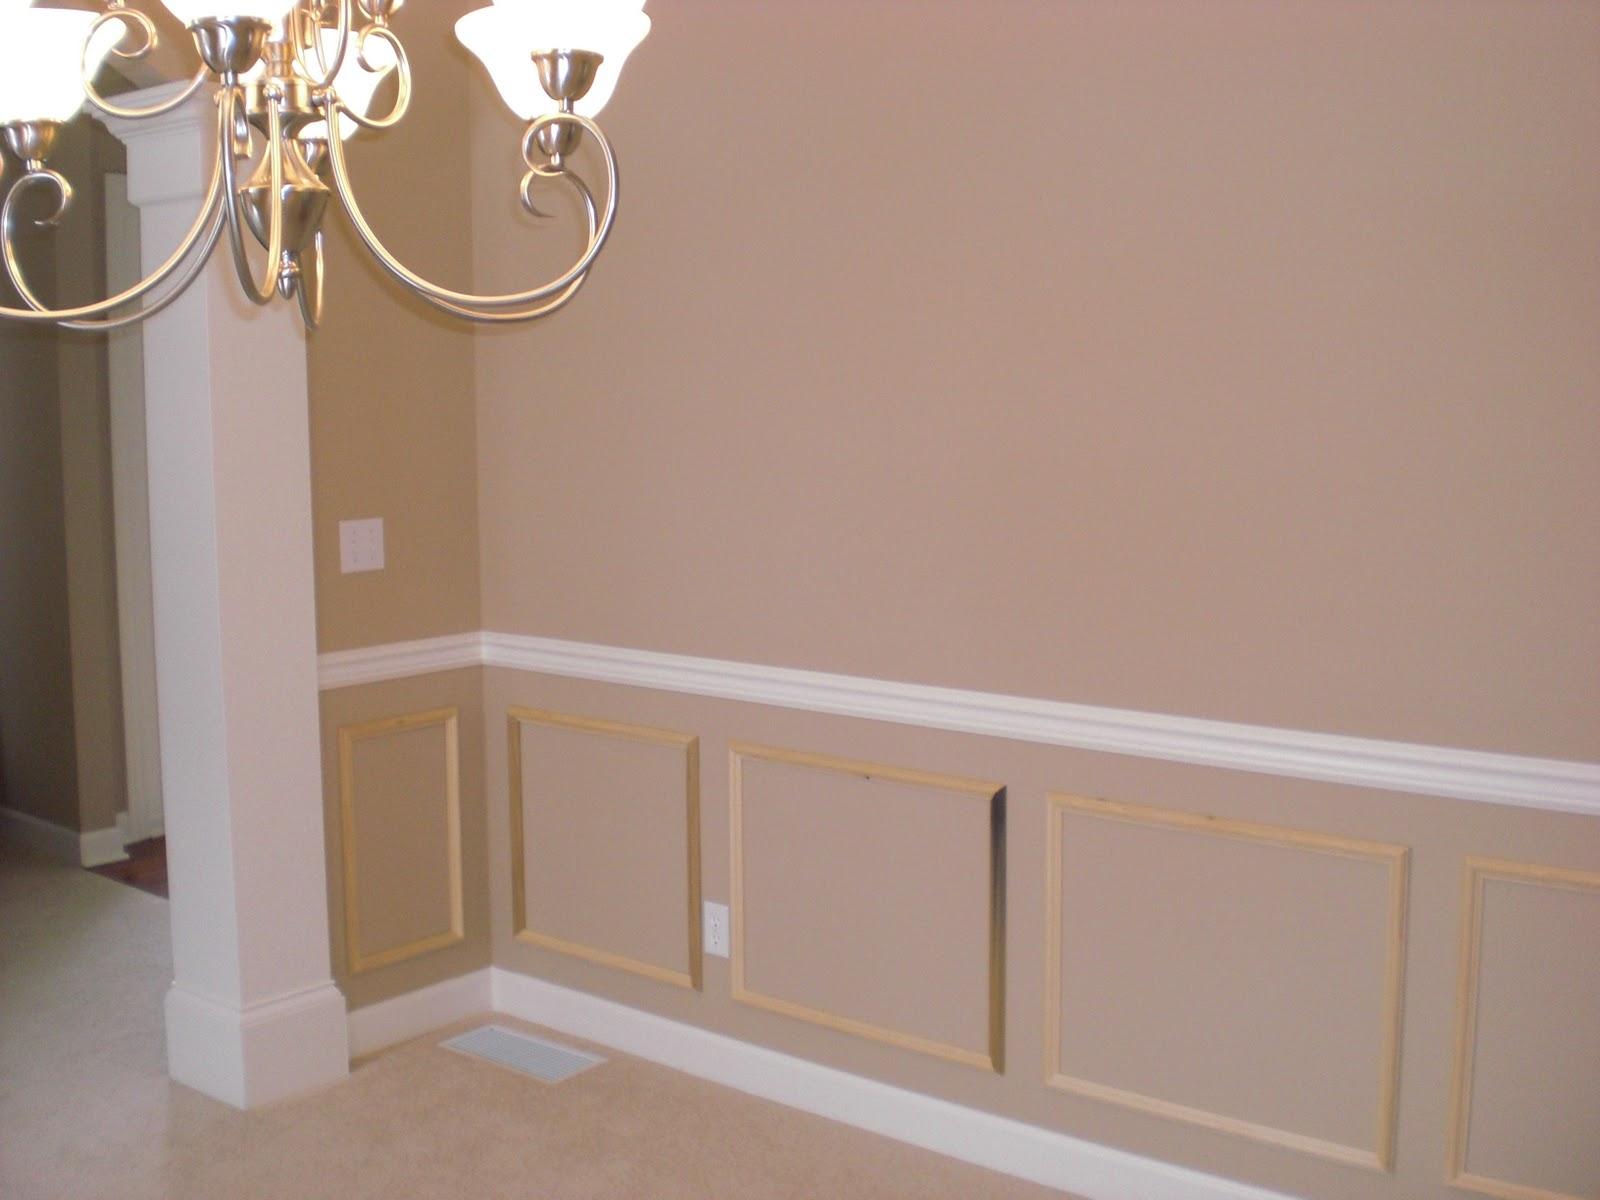 Image of: diy chair rail designs